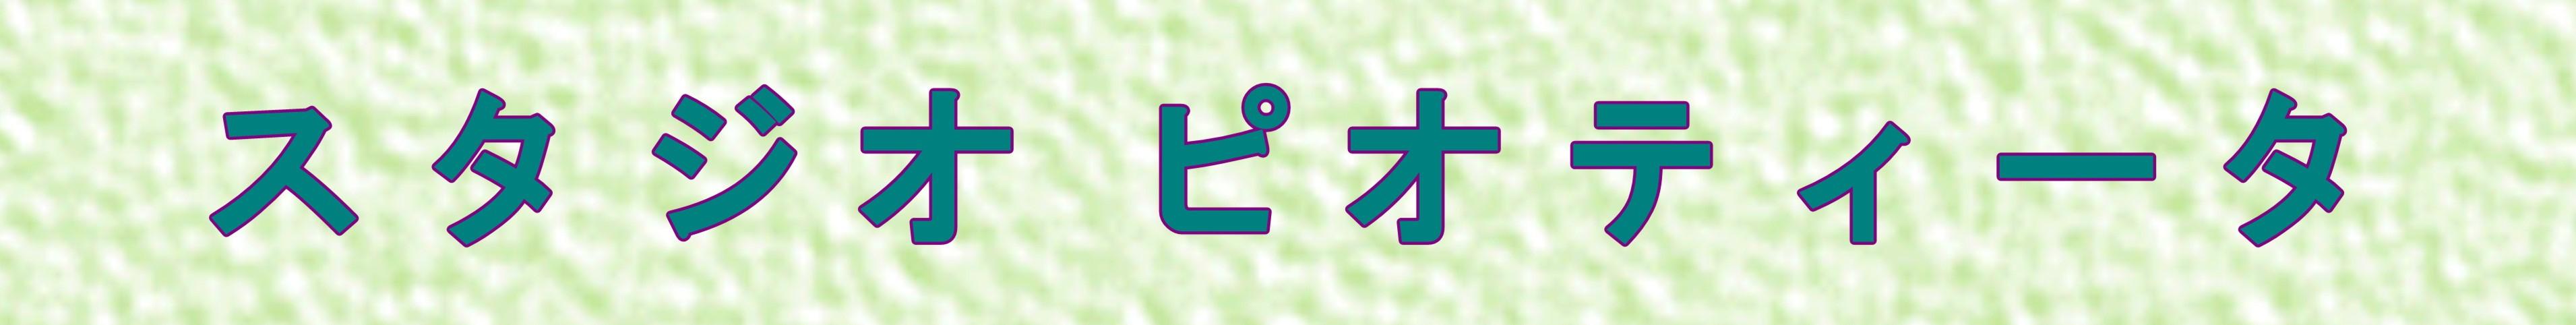 4 banners JPG line